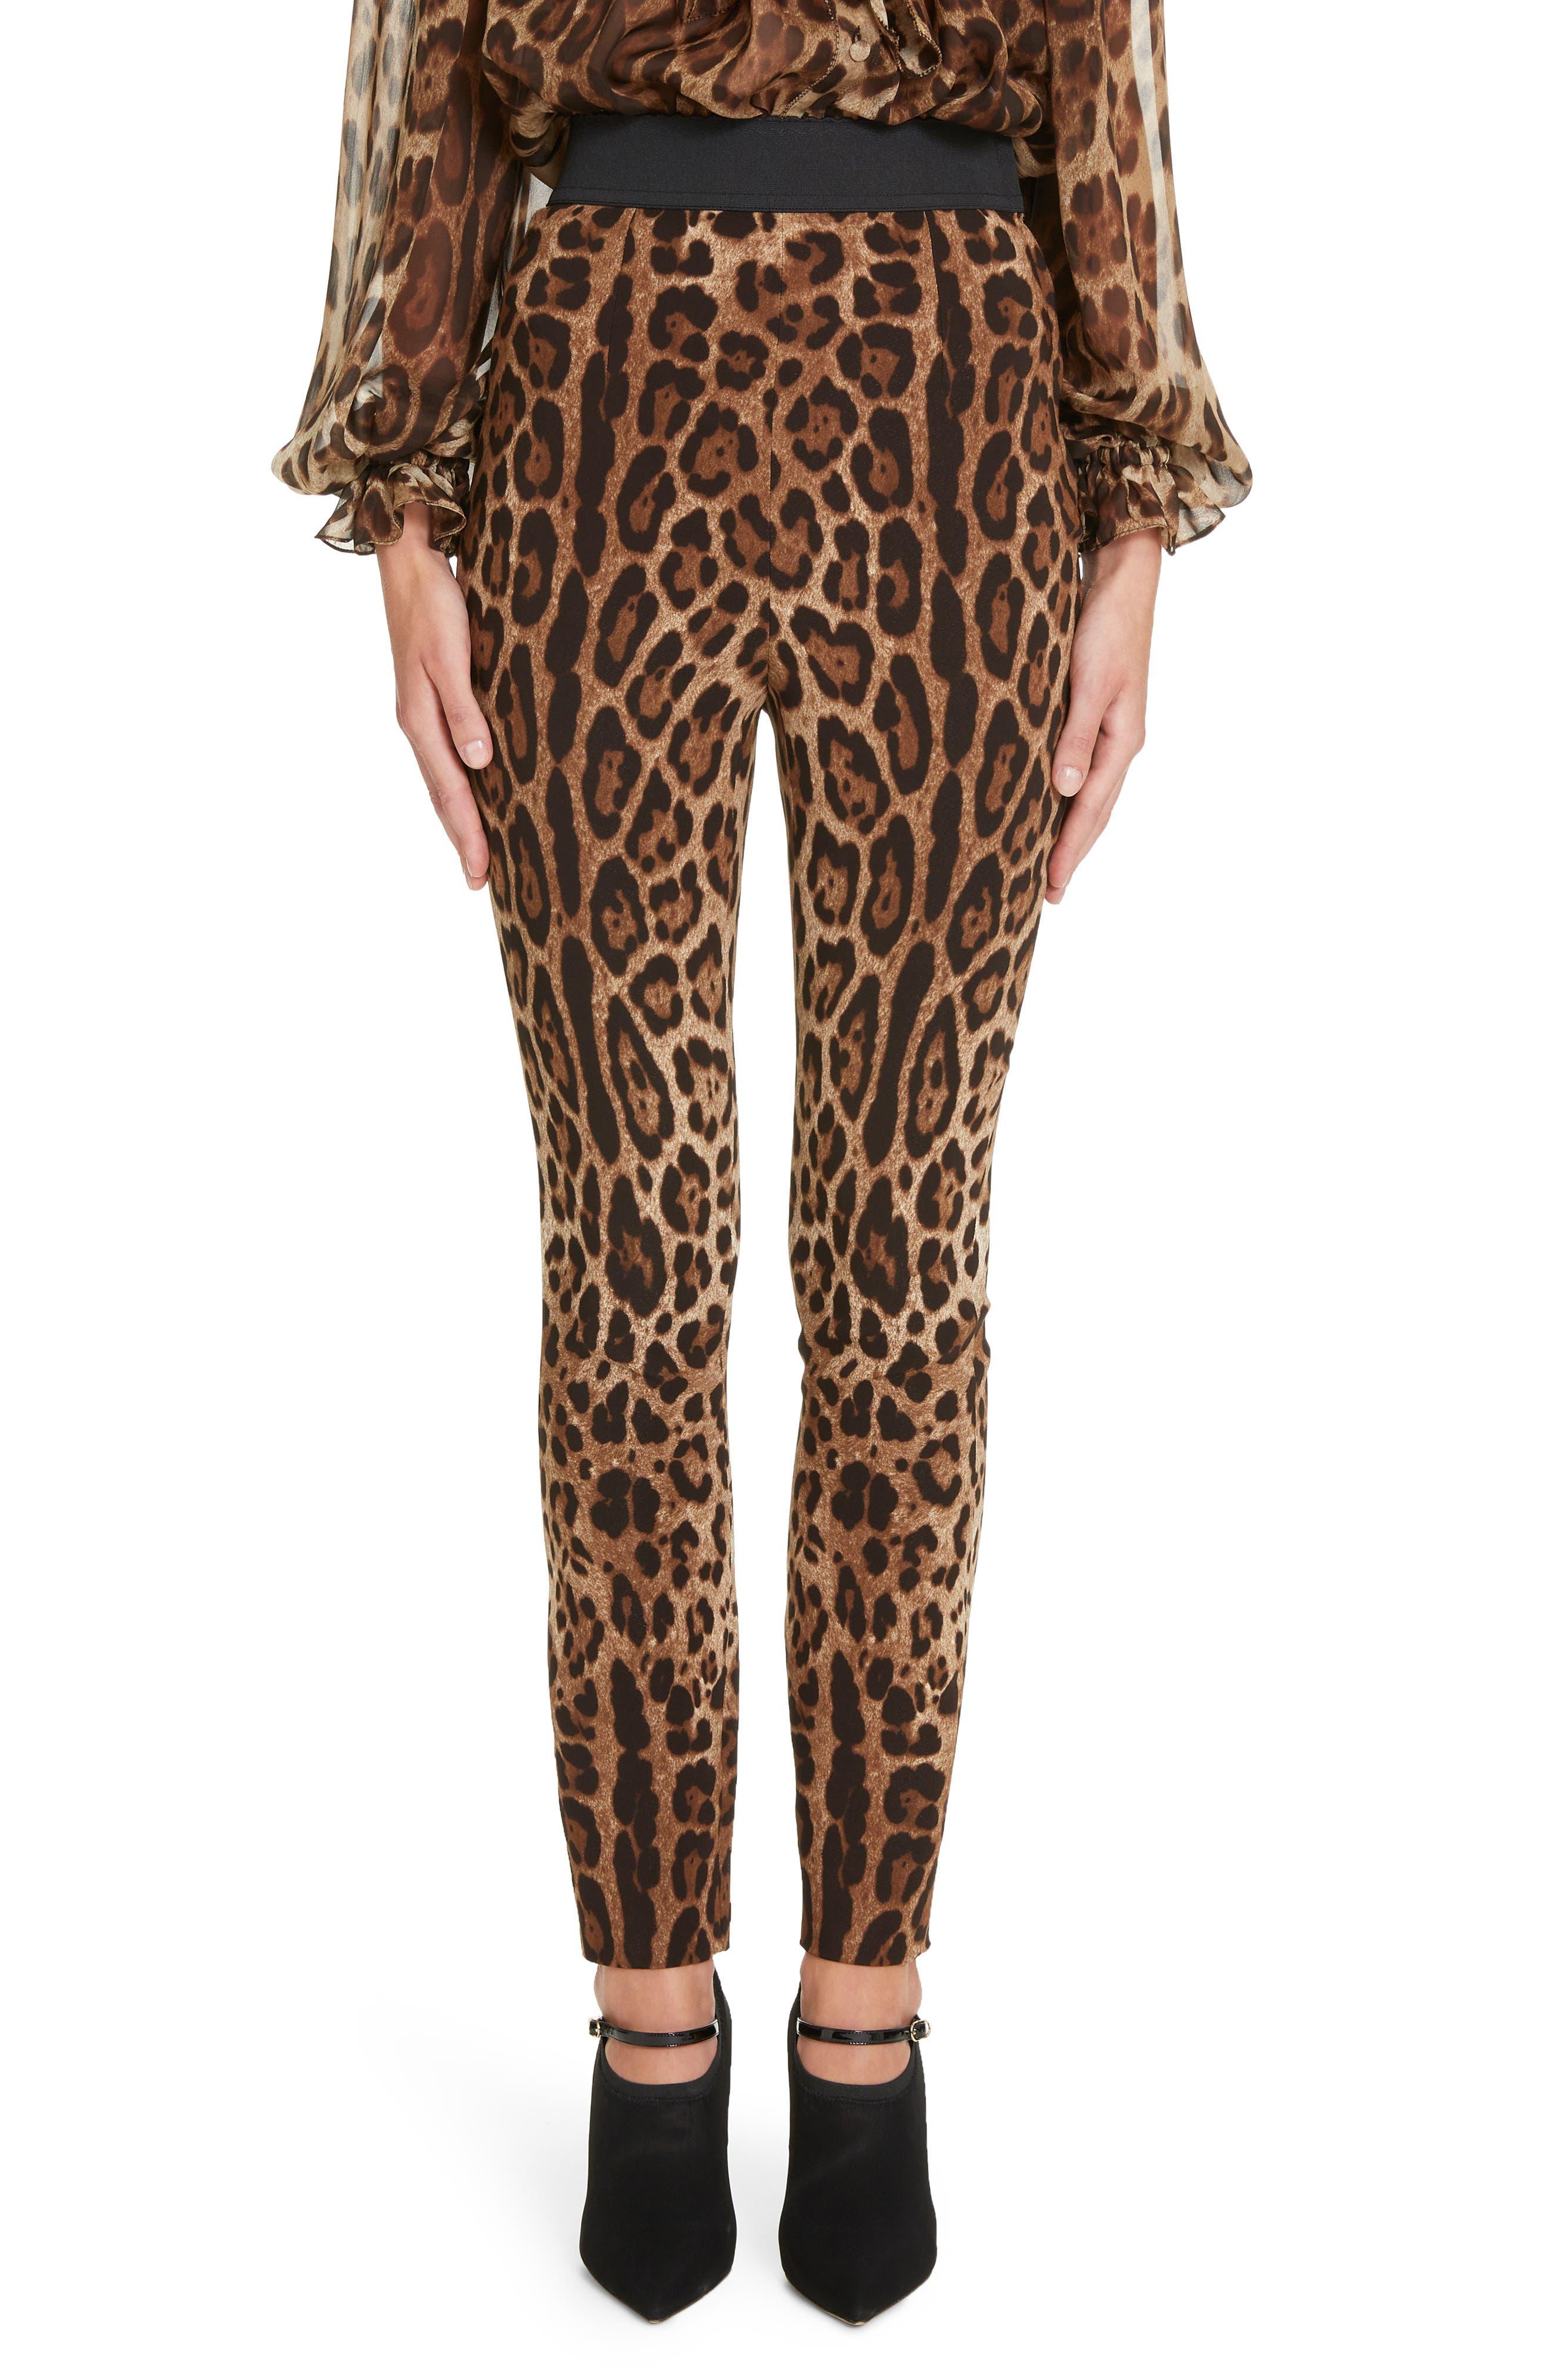 DOLCE&GABBANA, Leopard Print Cady Leggings, Main thumbnail 1, color, LEO